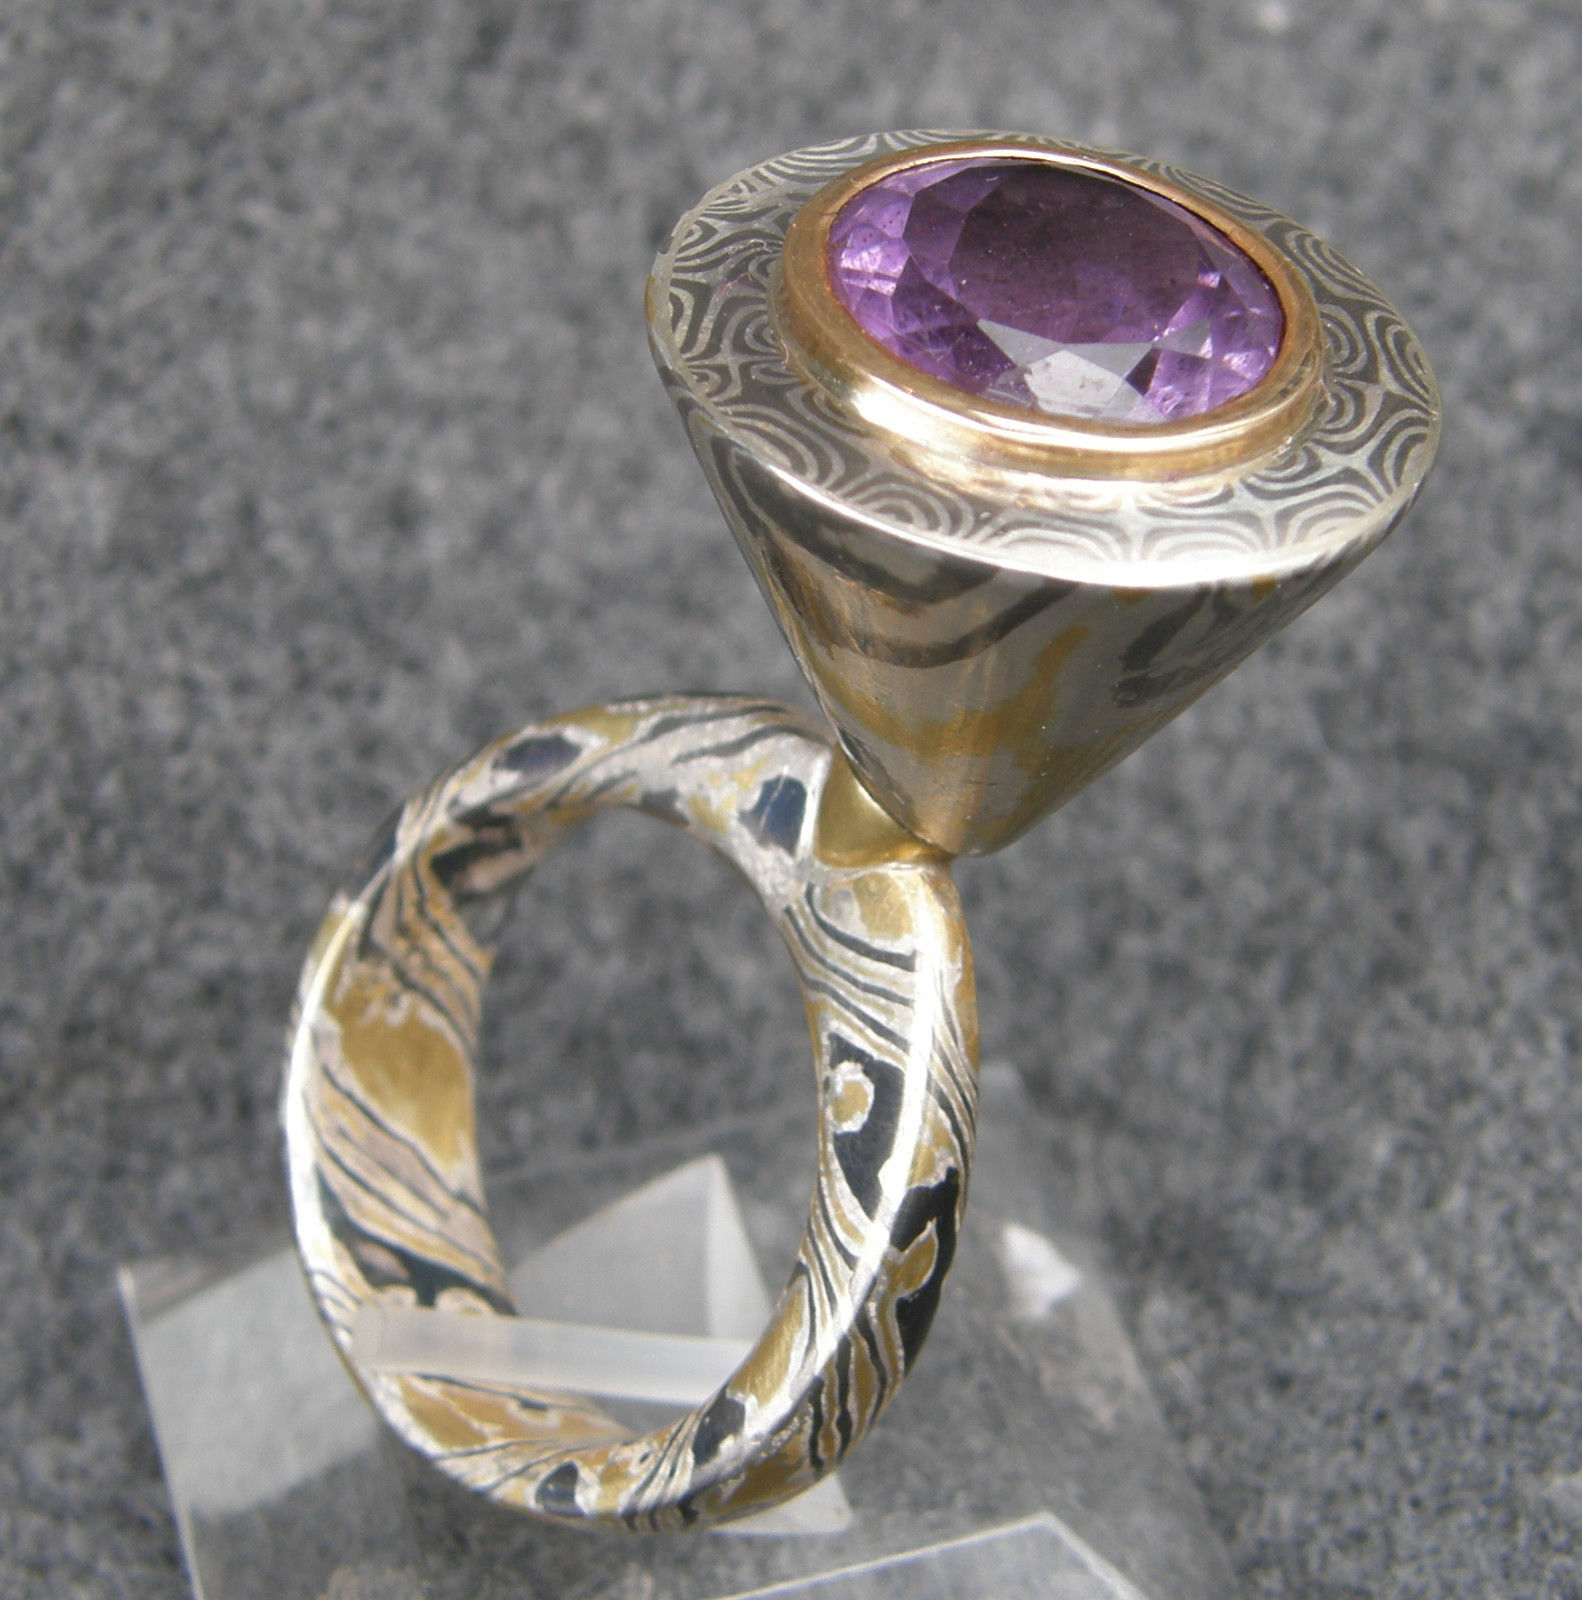 Unikat Ring Mokume Gane Gold Palladium Silber Amethyst kinetisch drehbar Lila